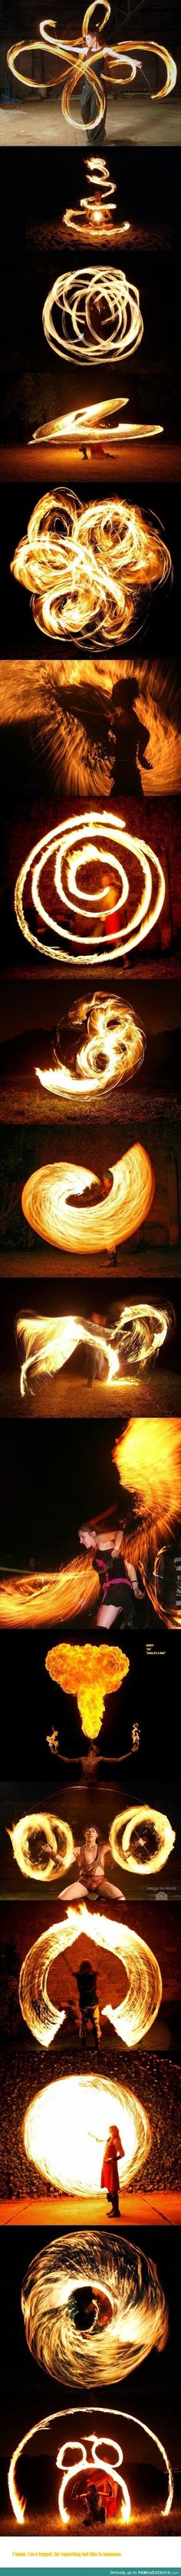 Firebenders